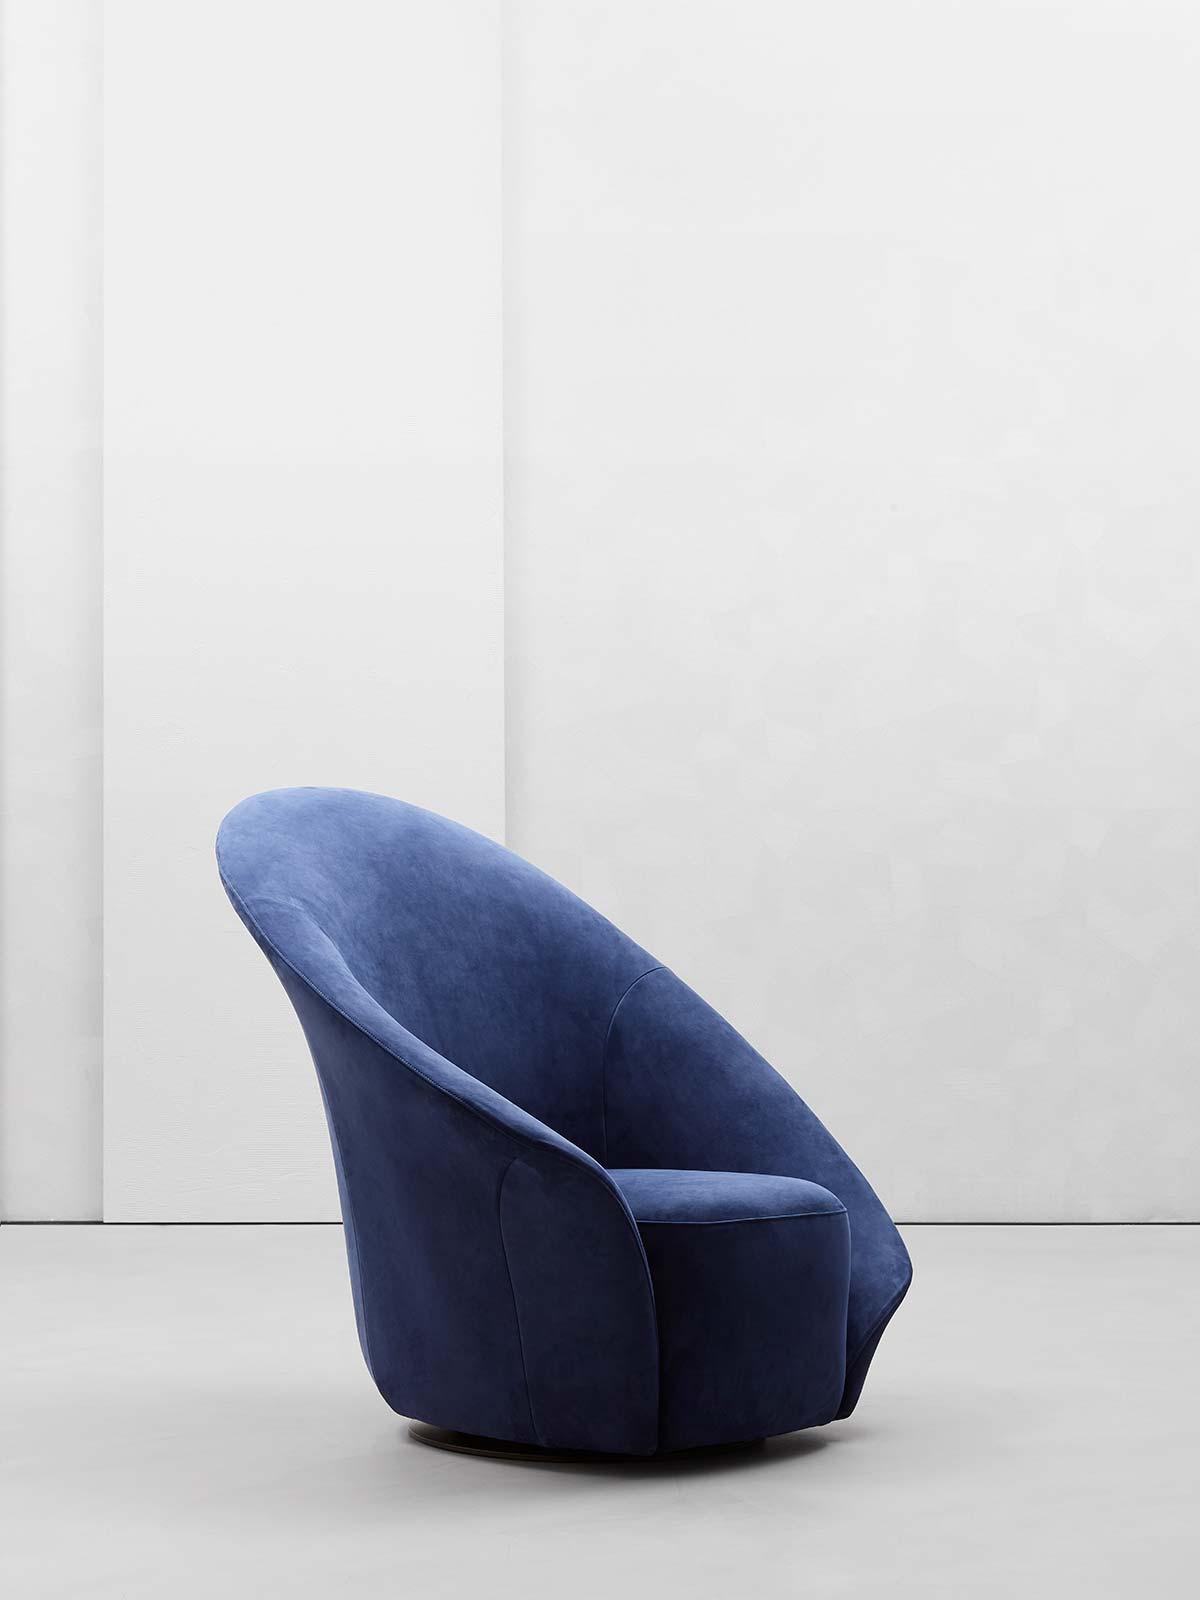 Lilia by Flou, Design Steve Leung